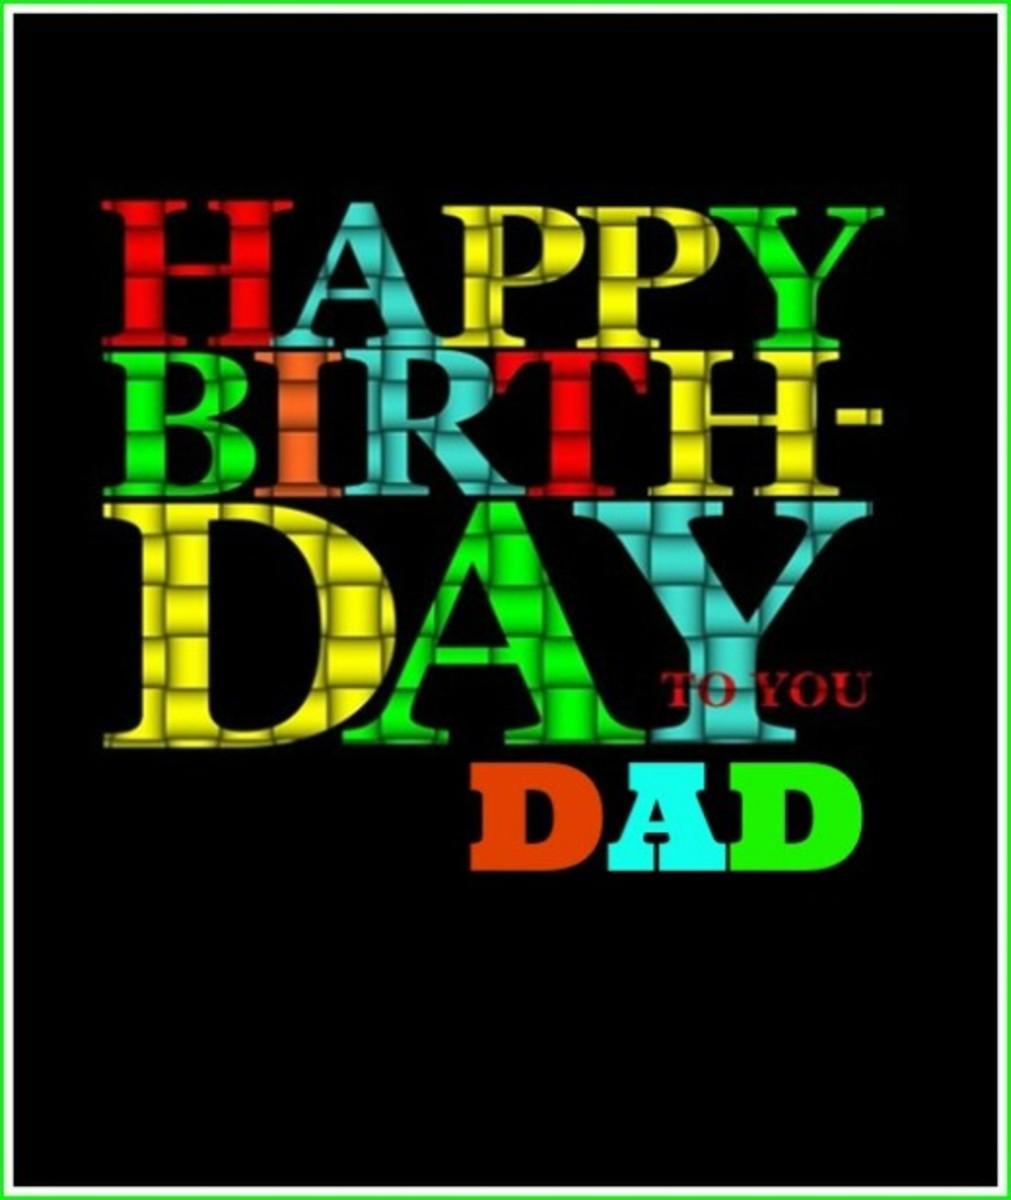 Happy Birthday Dad Greeting